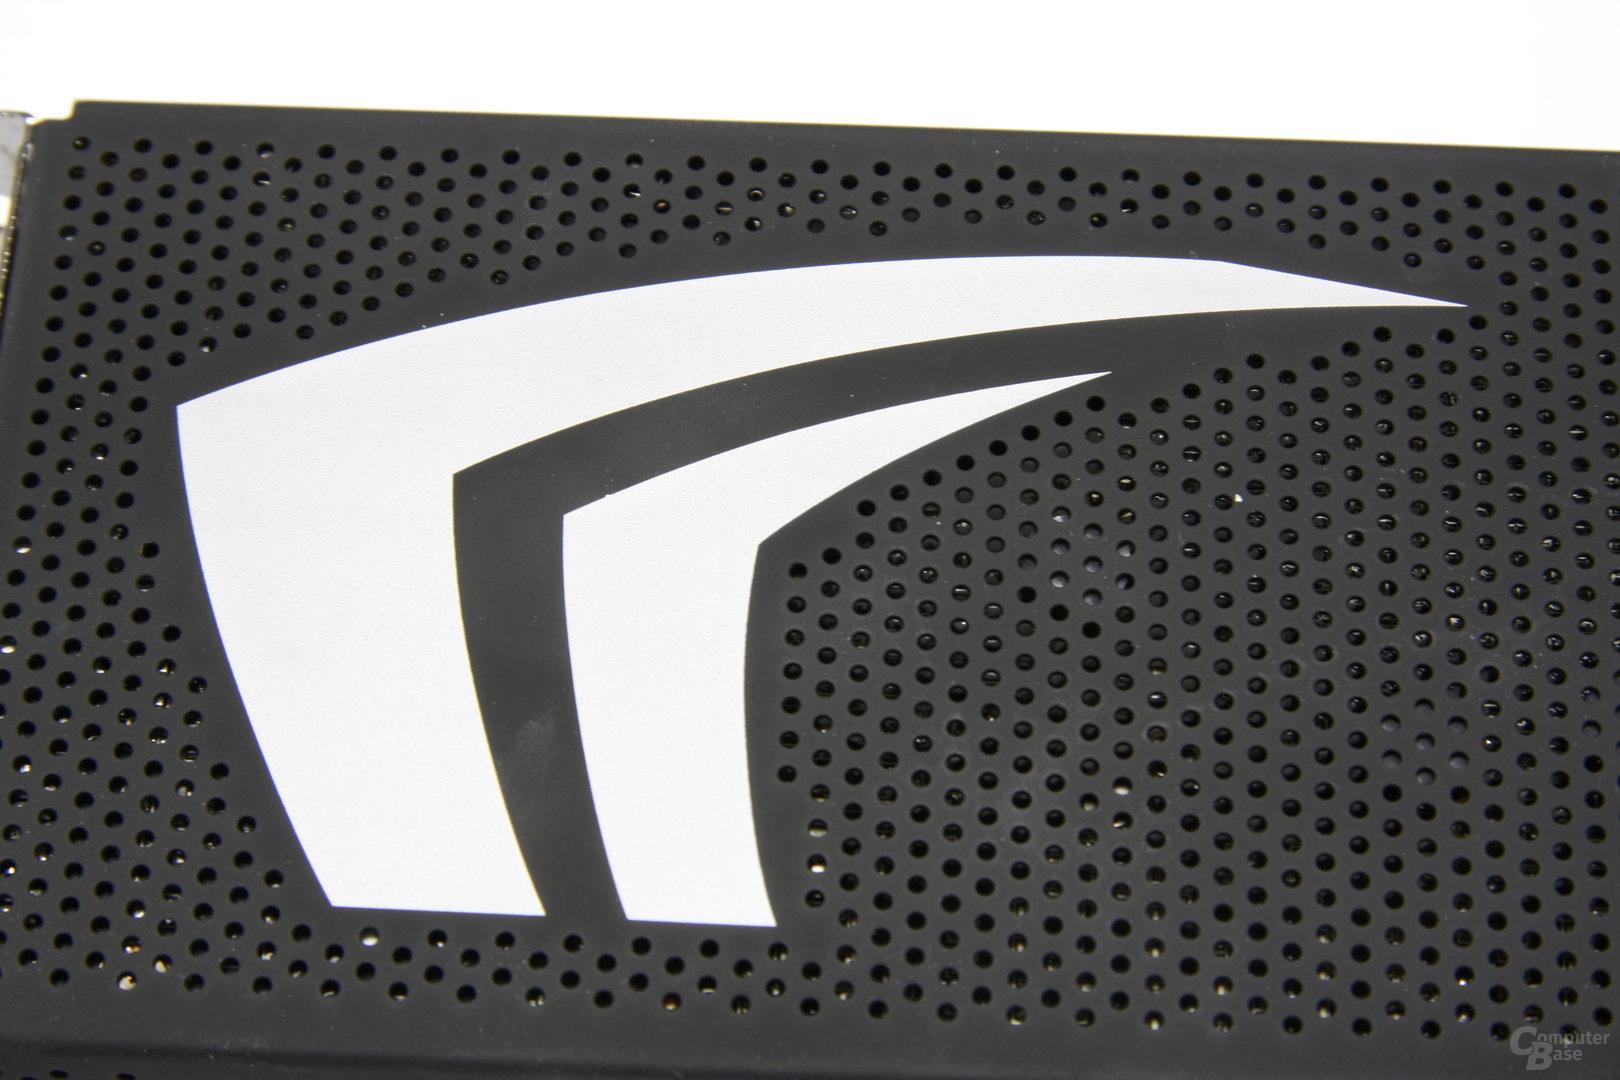 GeForce GTX 295 Kühlerdetail